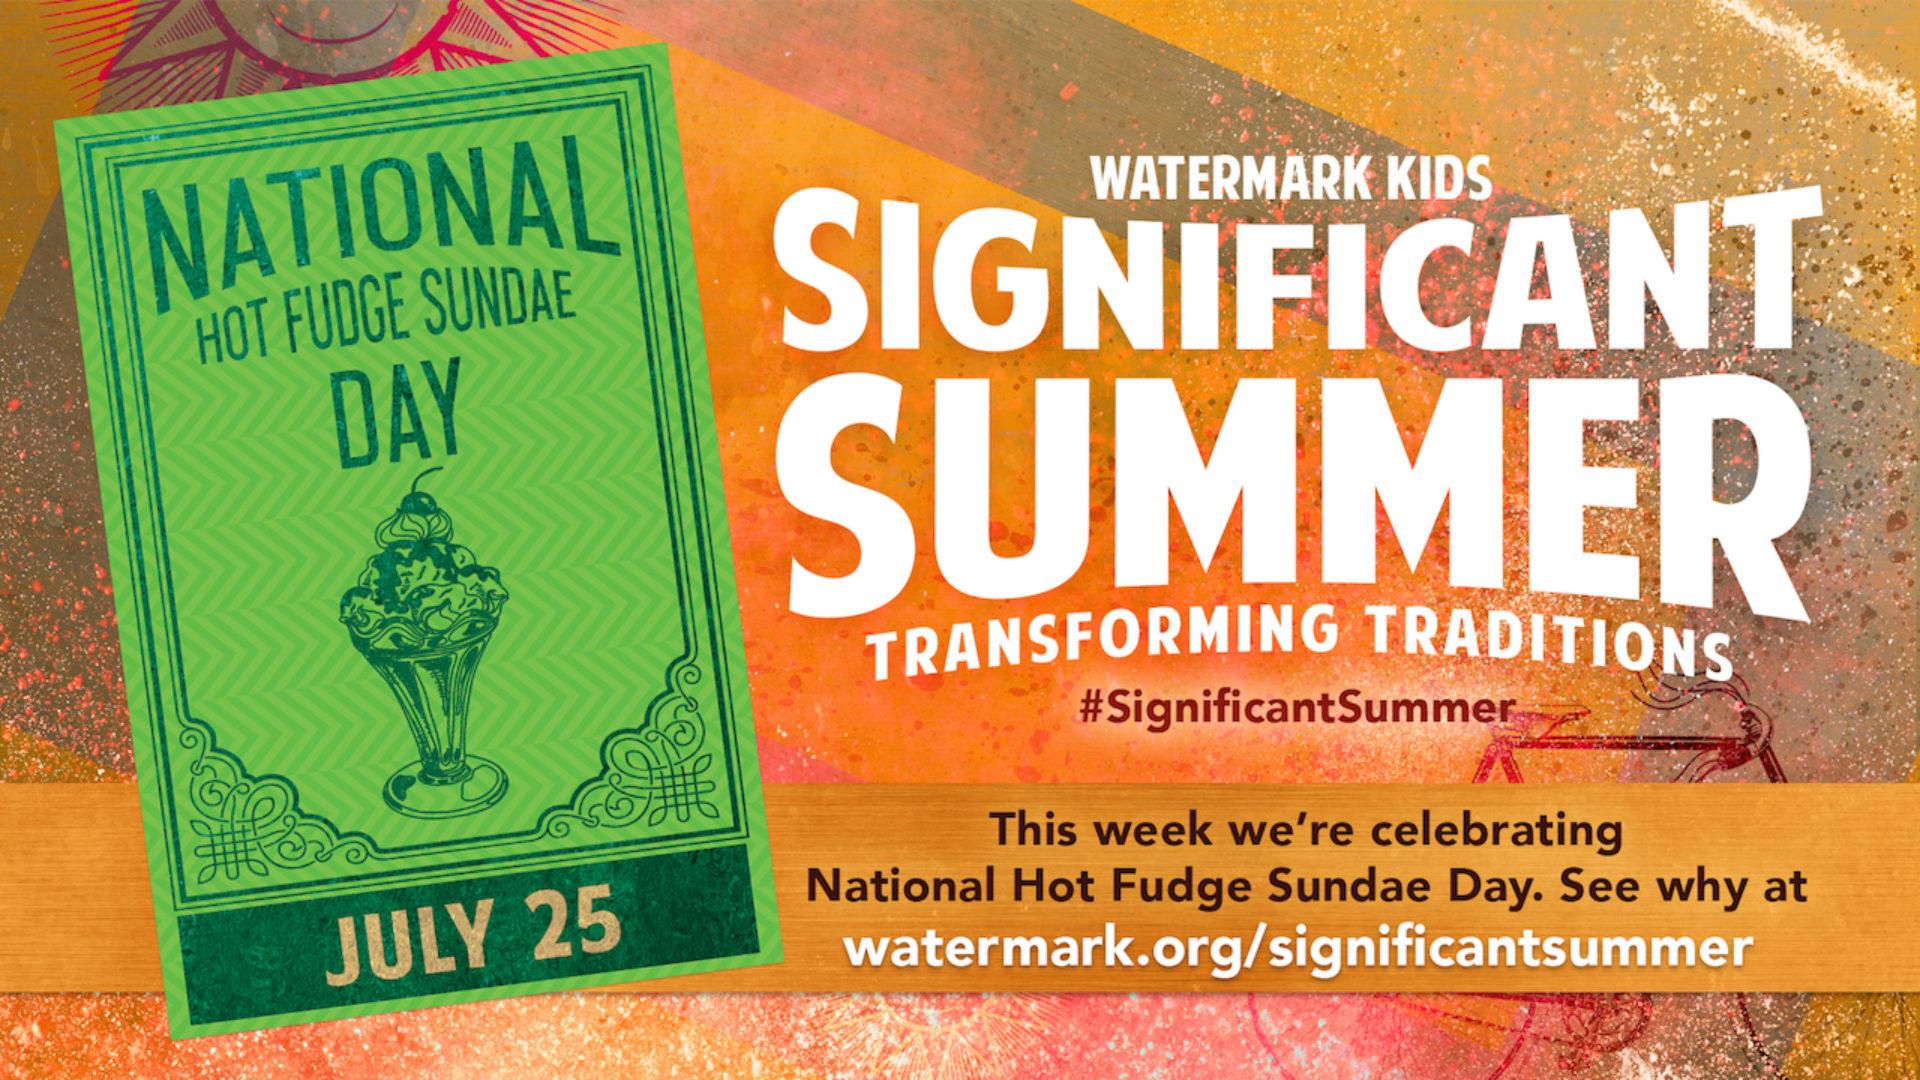 Significant Summer Week 8: National Hot Fudge Sundae Day Hero Image